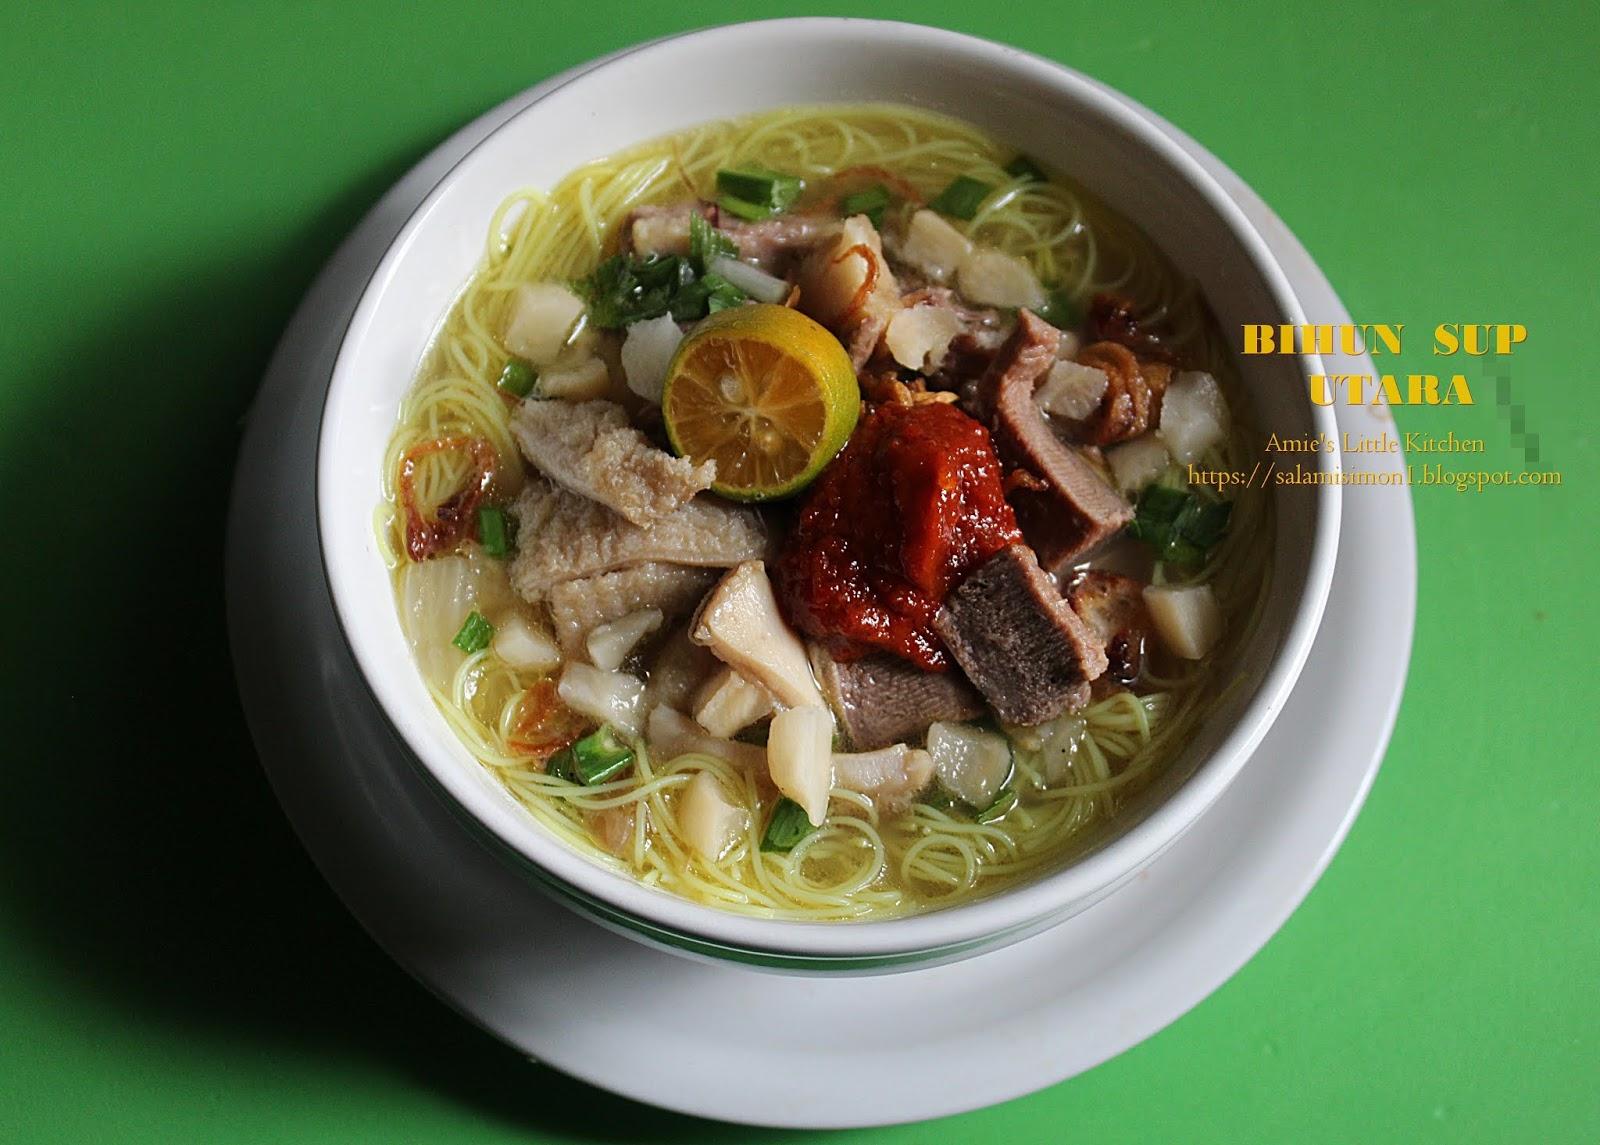 Amie S Little Kitchen Resipi Bihun Sup Utara Yang Sangat Sedap